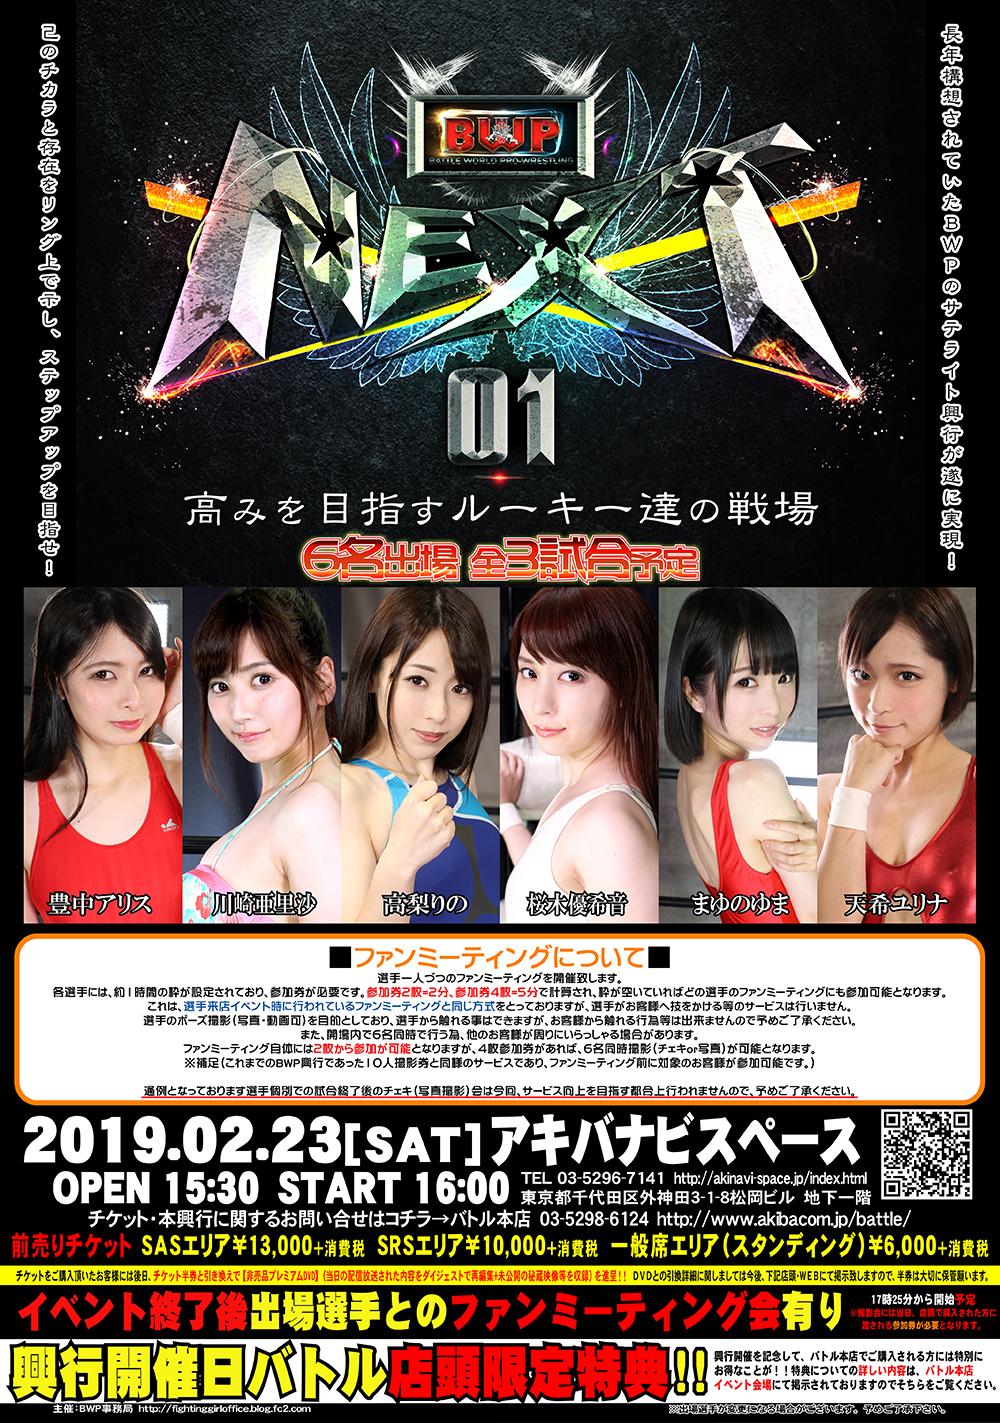 BWPNEXT01_宣伝ポスター2web